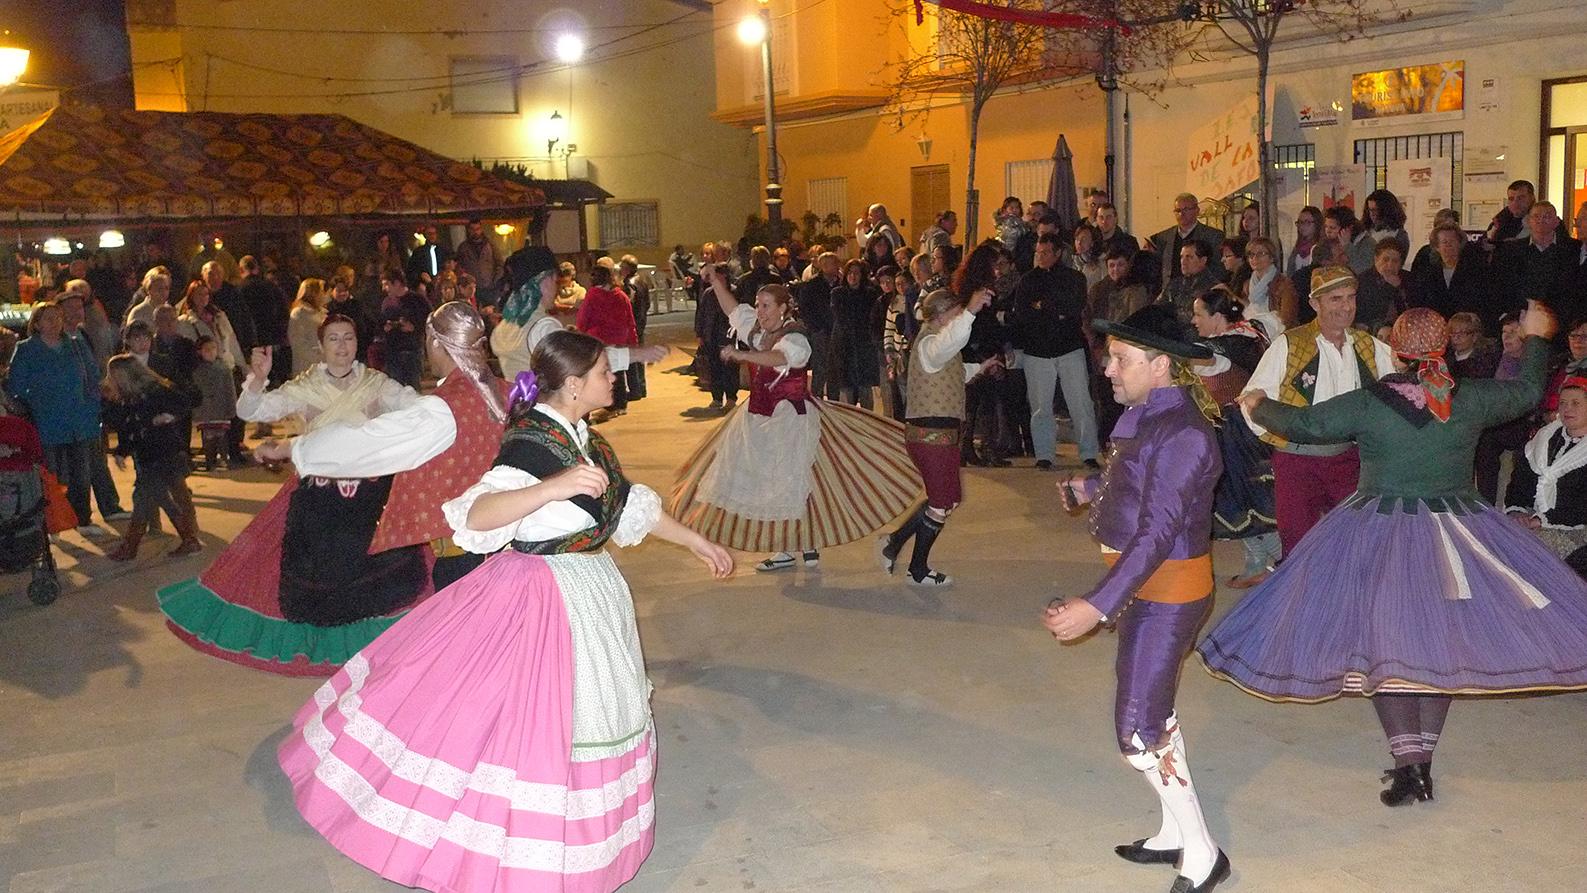 2014-02-23 - Baladre a Fira St. Marcia-ROTOVA (204)